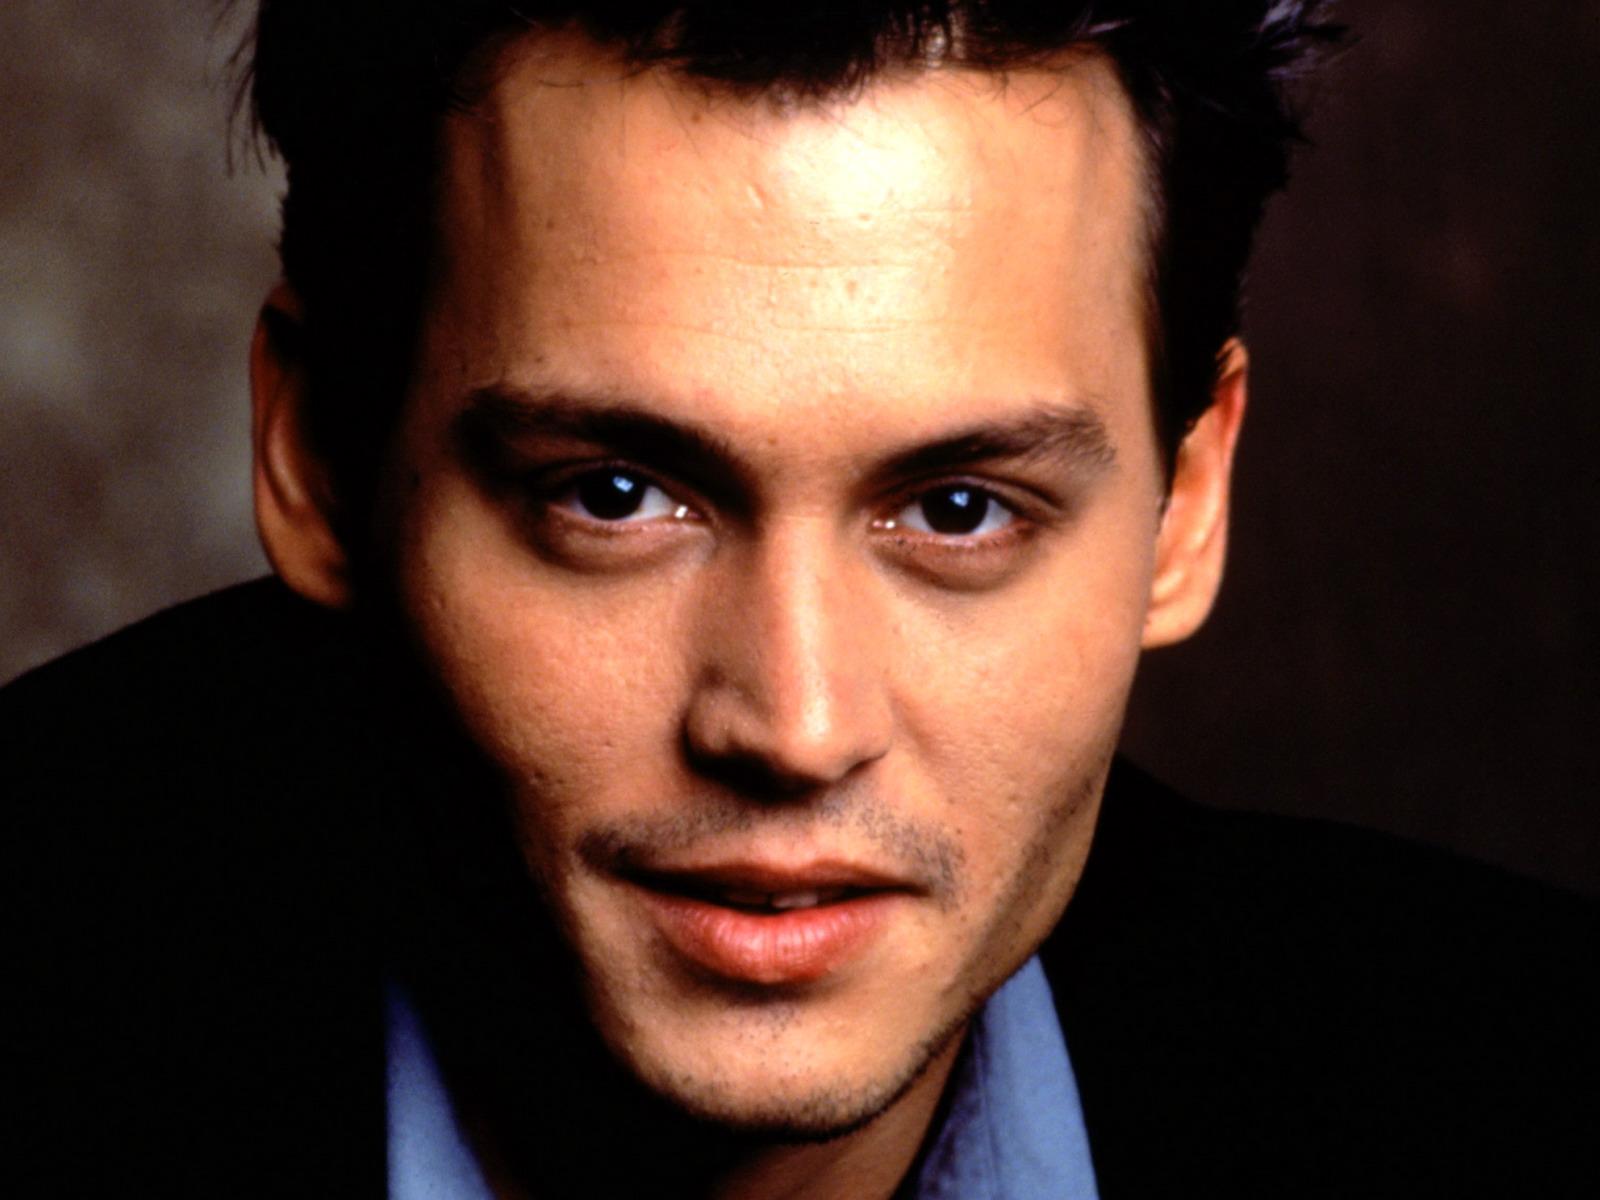 ... Depp, известный актер Джони Деп картинки: www.wallplanet.ru/photo/muzhchiny/dzhonni_depp/3-0-89